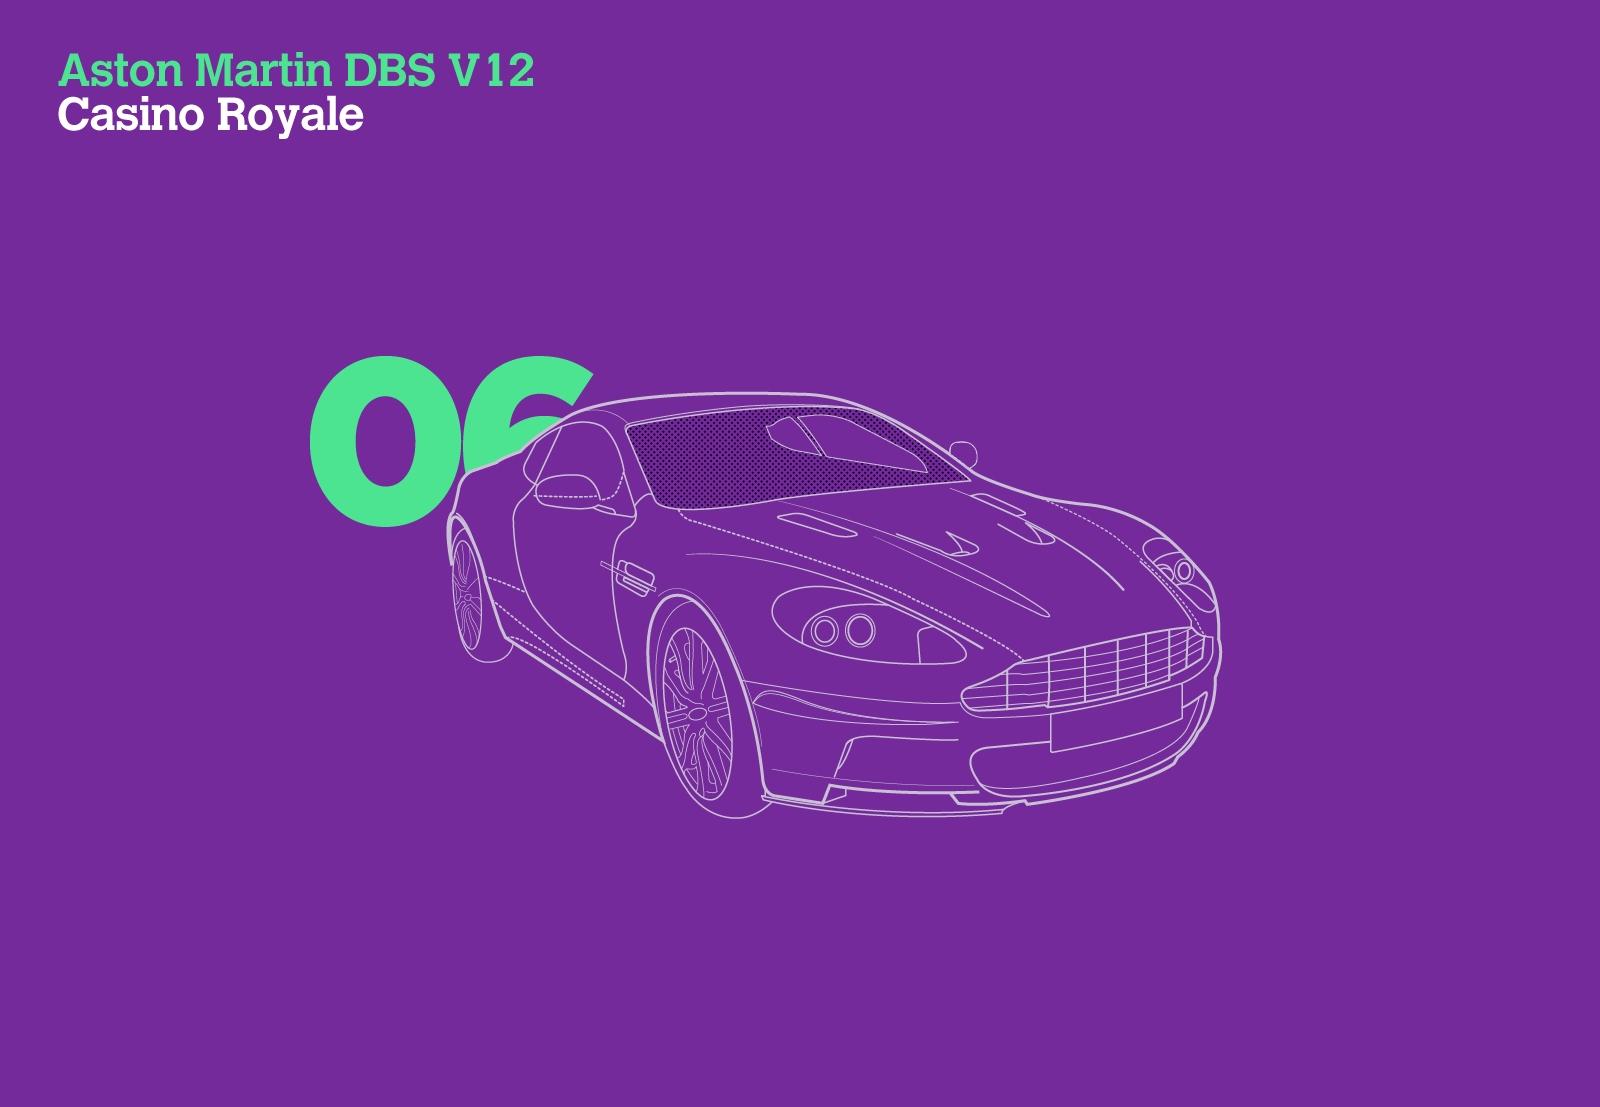 Aston Martin DBS V12 Casino Royale